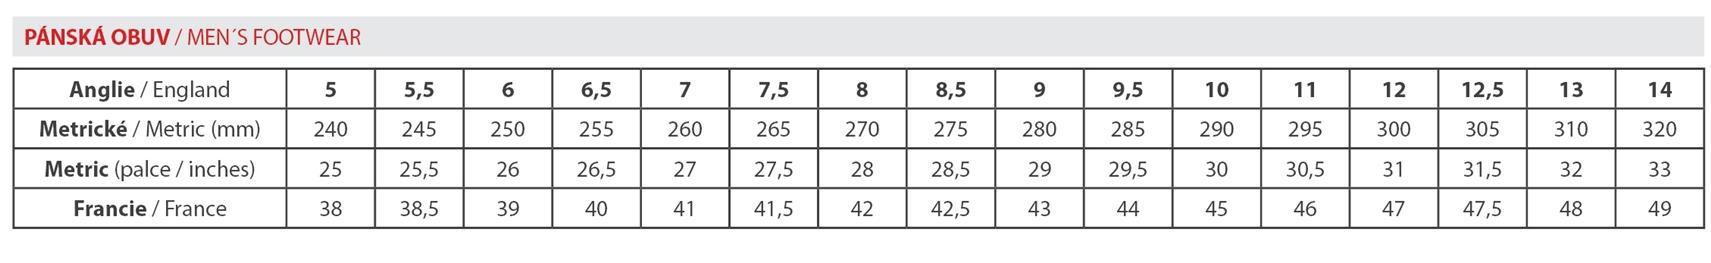 thmbp-nsk-obuv-tabulka-velikost-